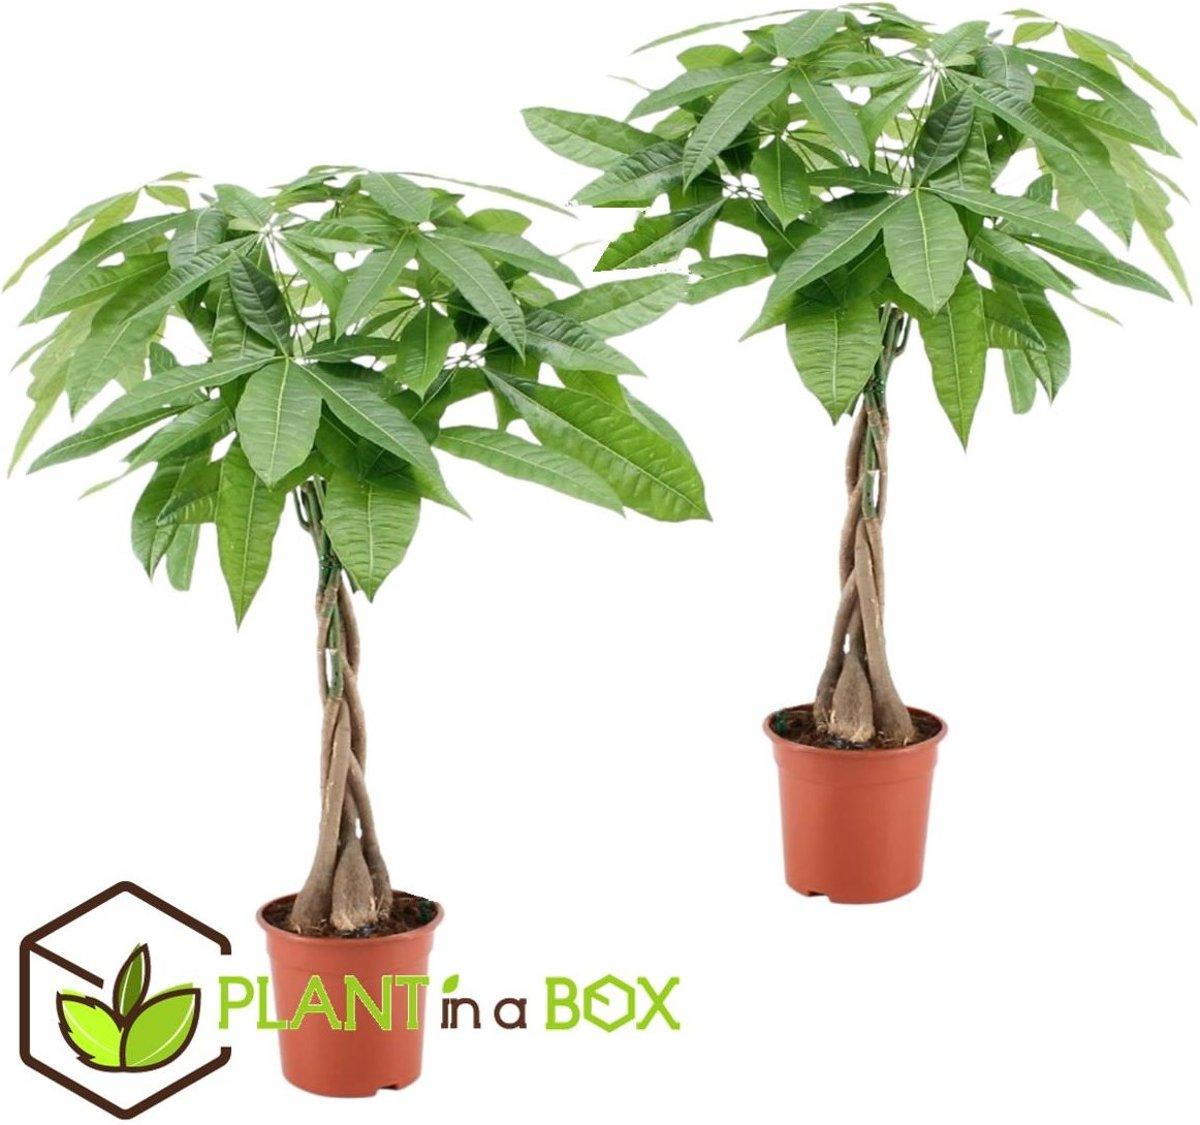 PLANT IN A BOX Pachira Aquatica - Money Tree - Set van 2 stuks - Hoogte ↕ 60 - 70 cm